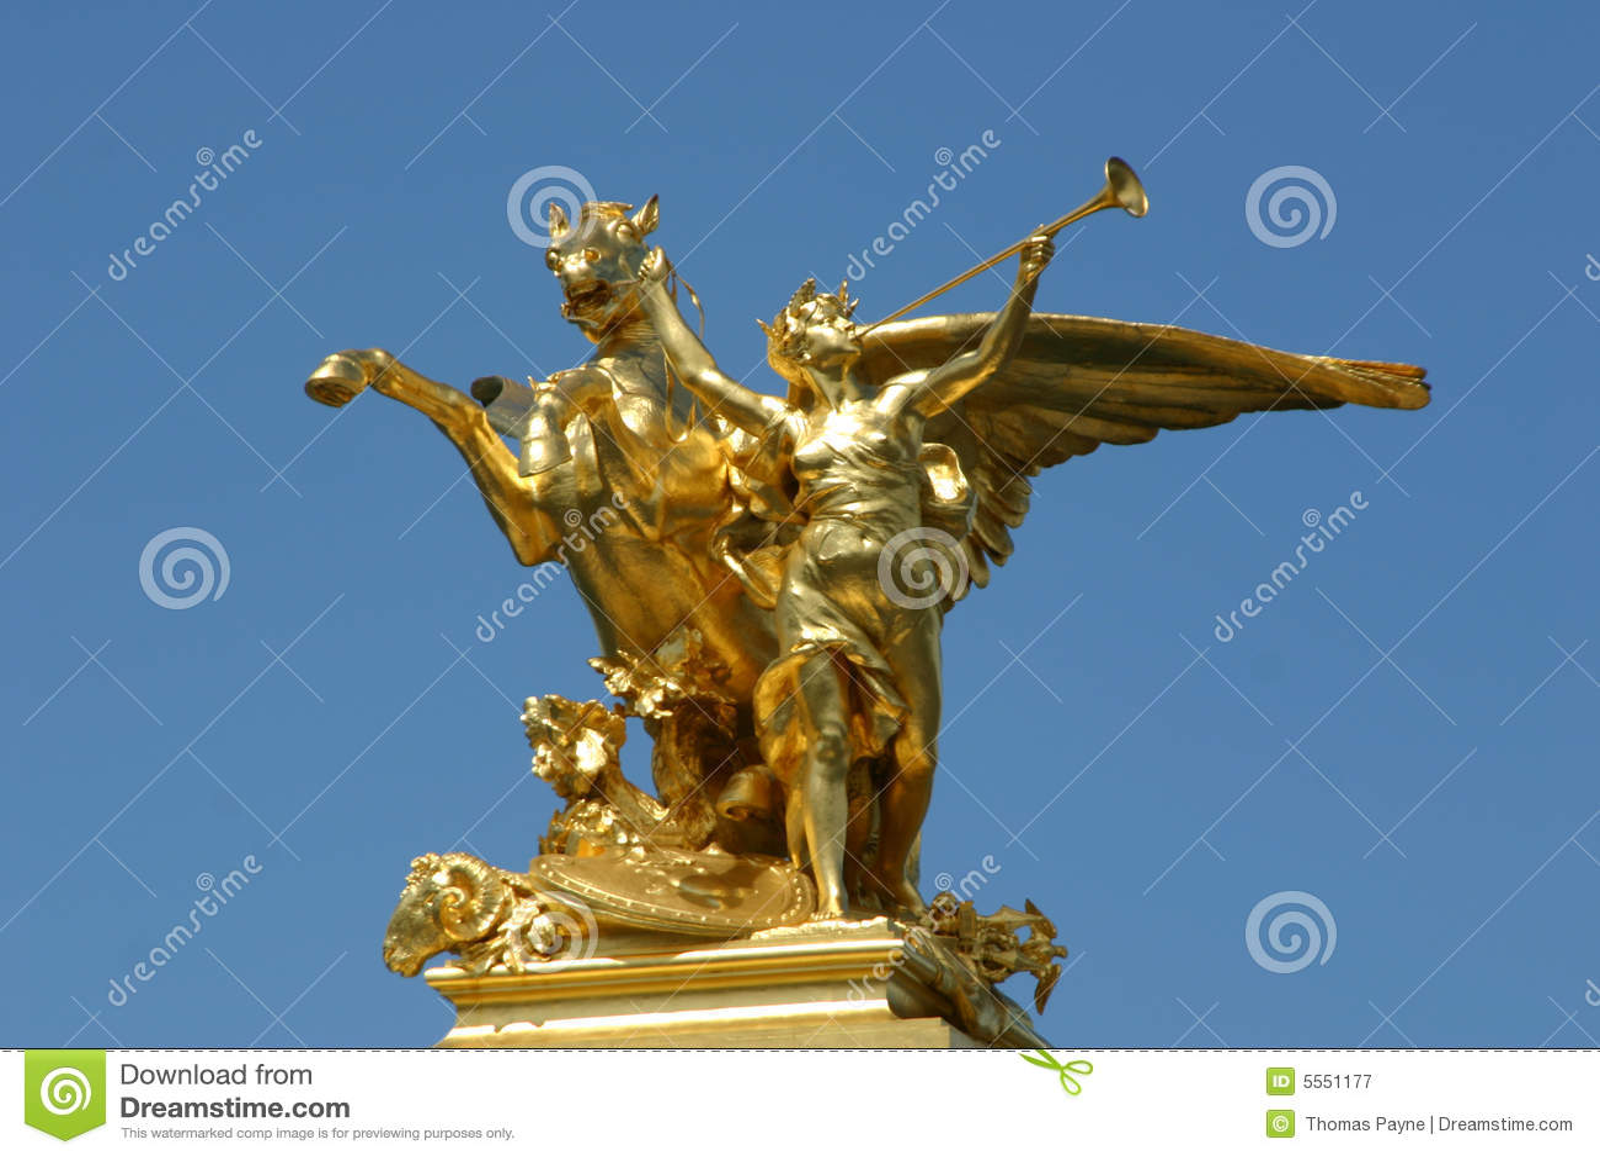 Stunning Nude Sexy Woman Bronze Sculpture